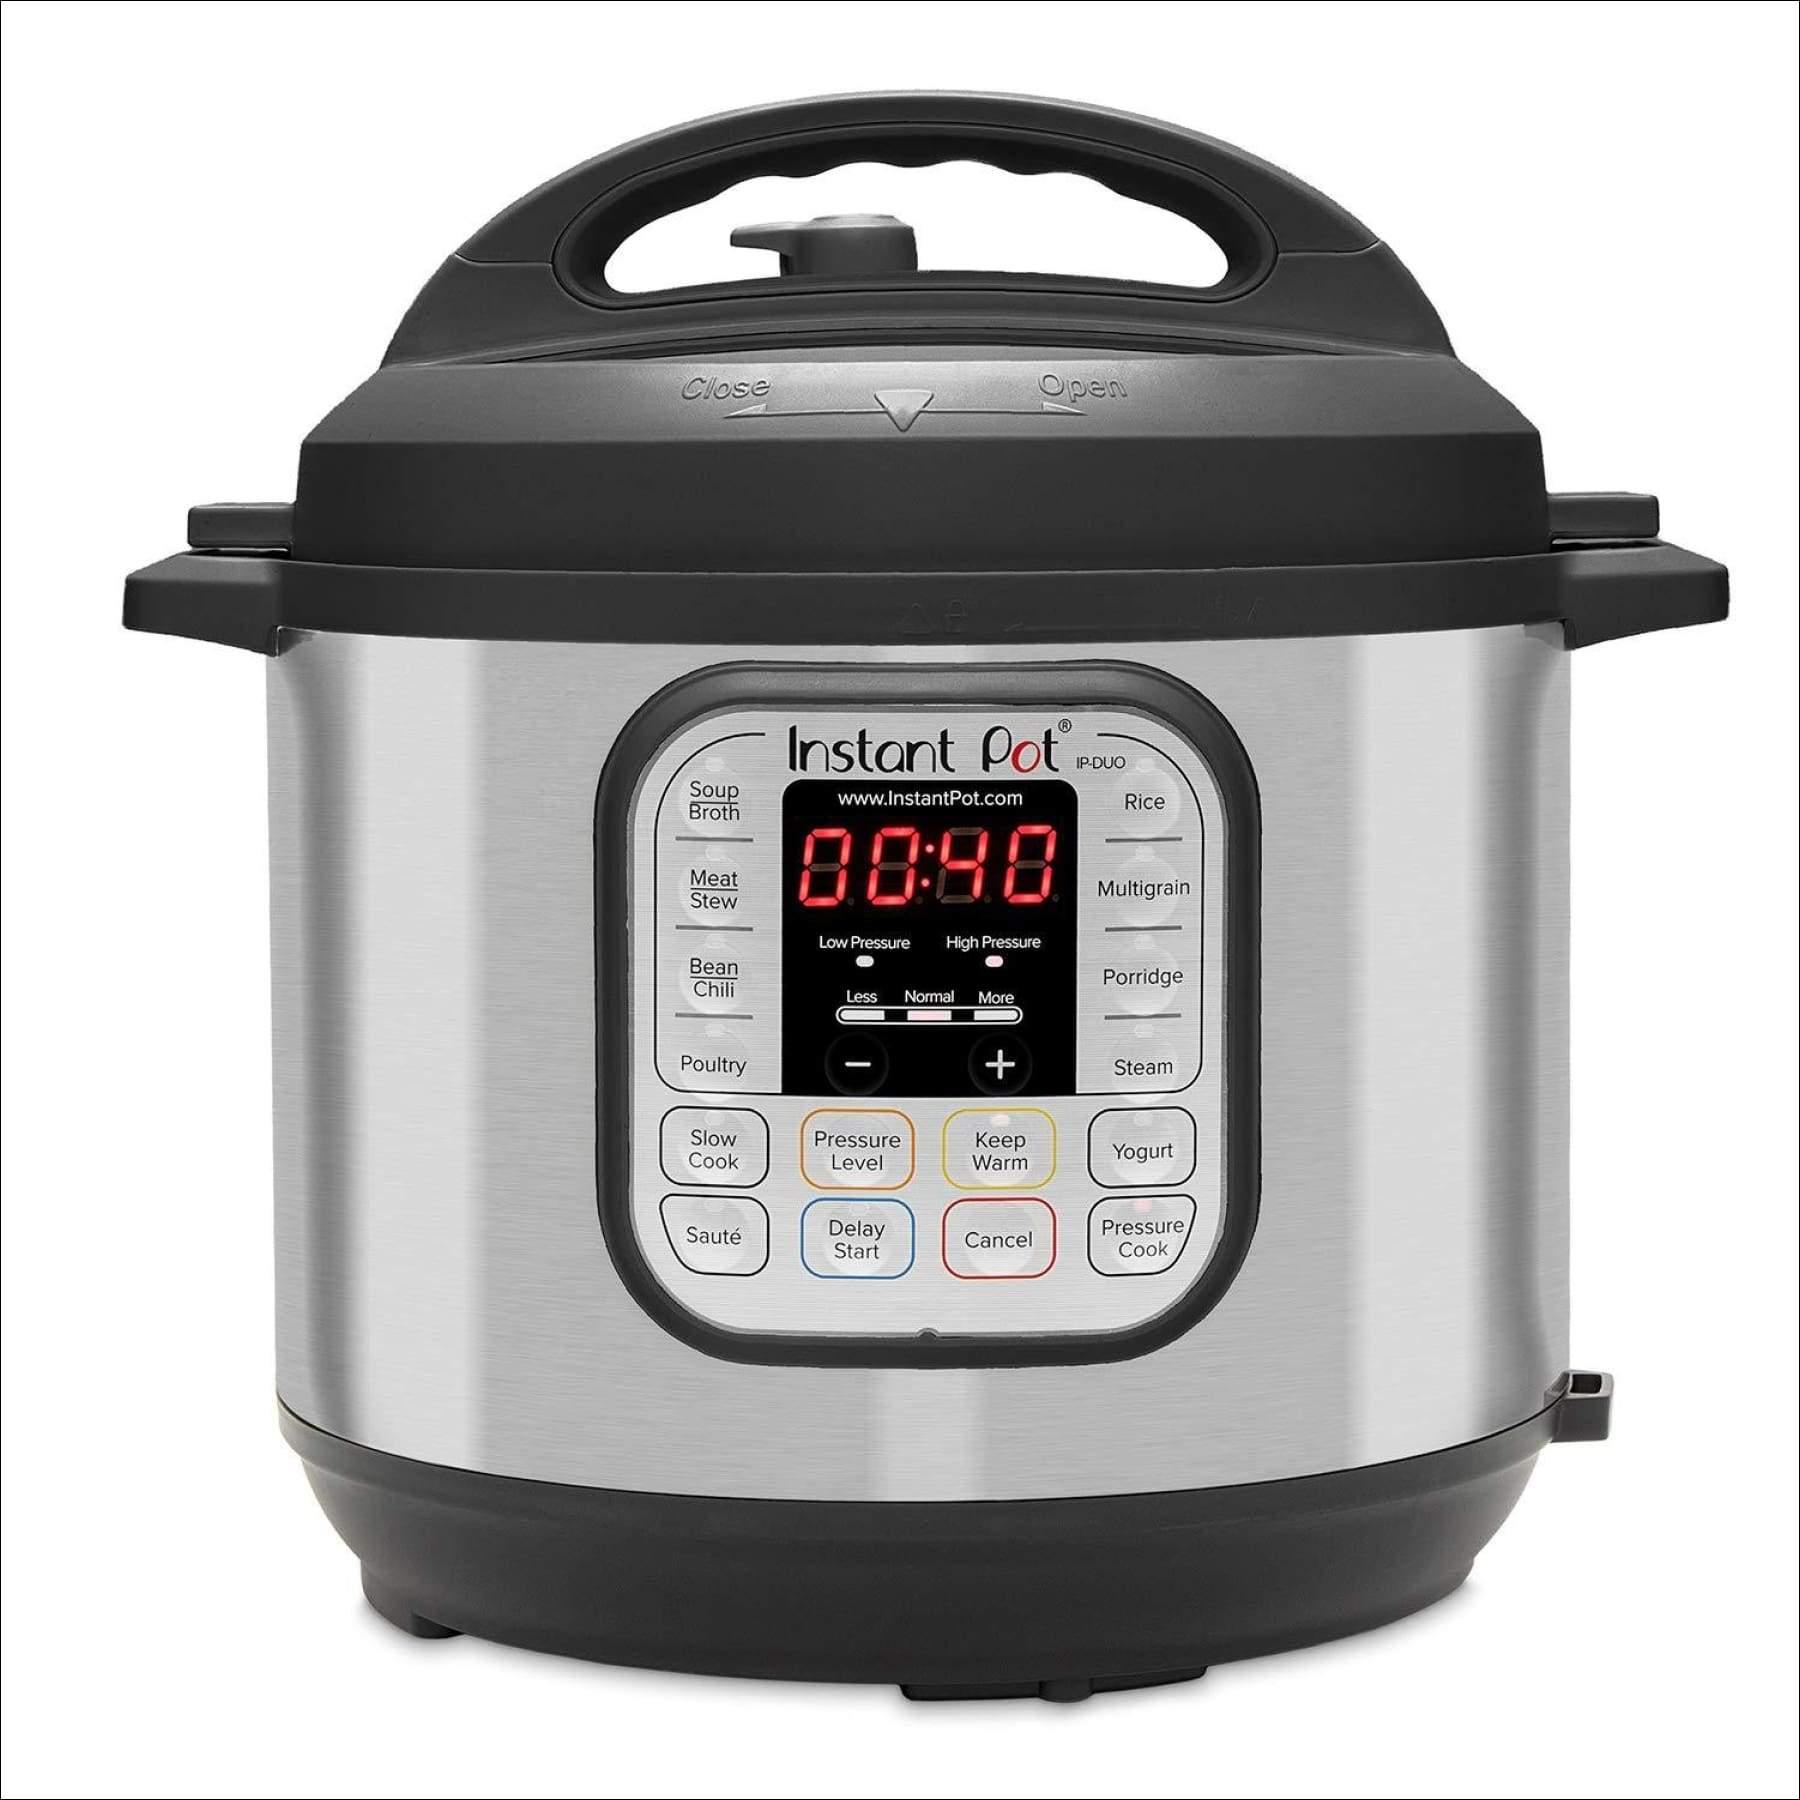 Programmable Pressure Cooker Stainless Steel Kitchen Saute Steamer Warmer 6 Qt